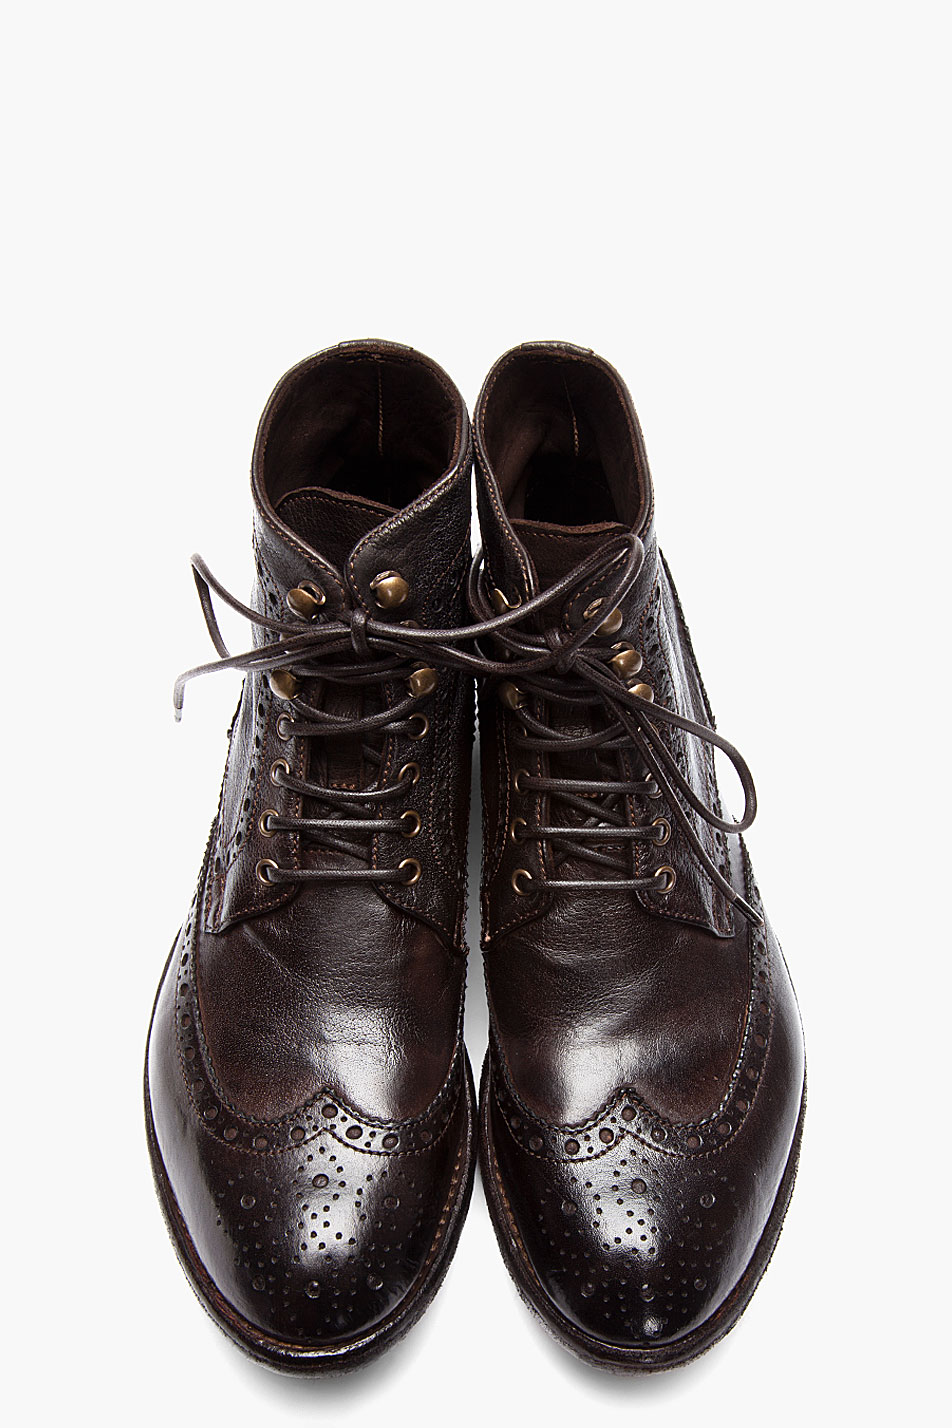 J Shoes Womens Brogues